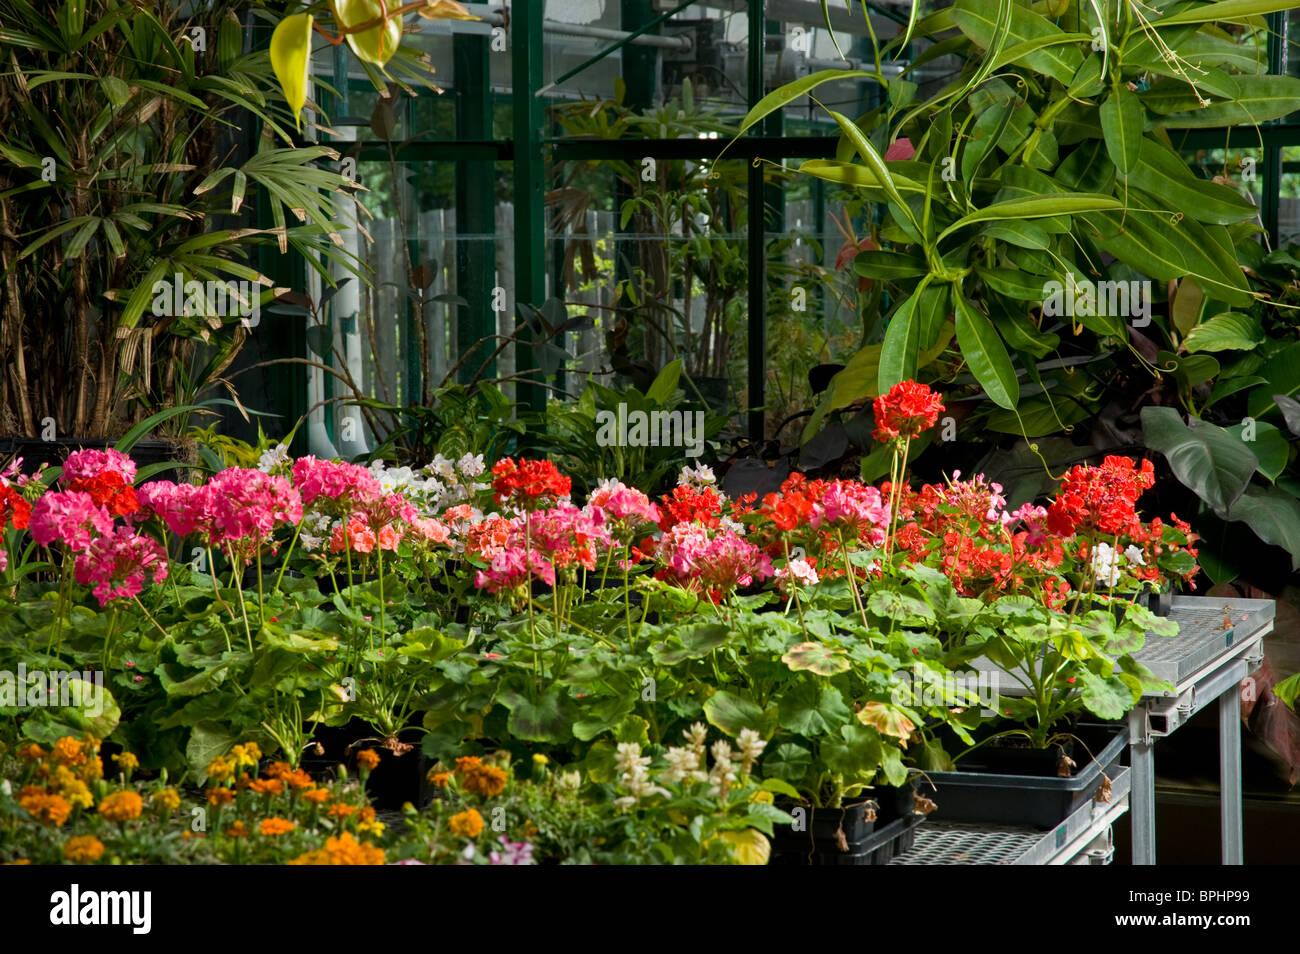 Flowers In Greenhouse Nursery - Stock Image